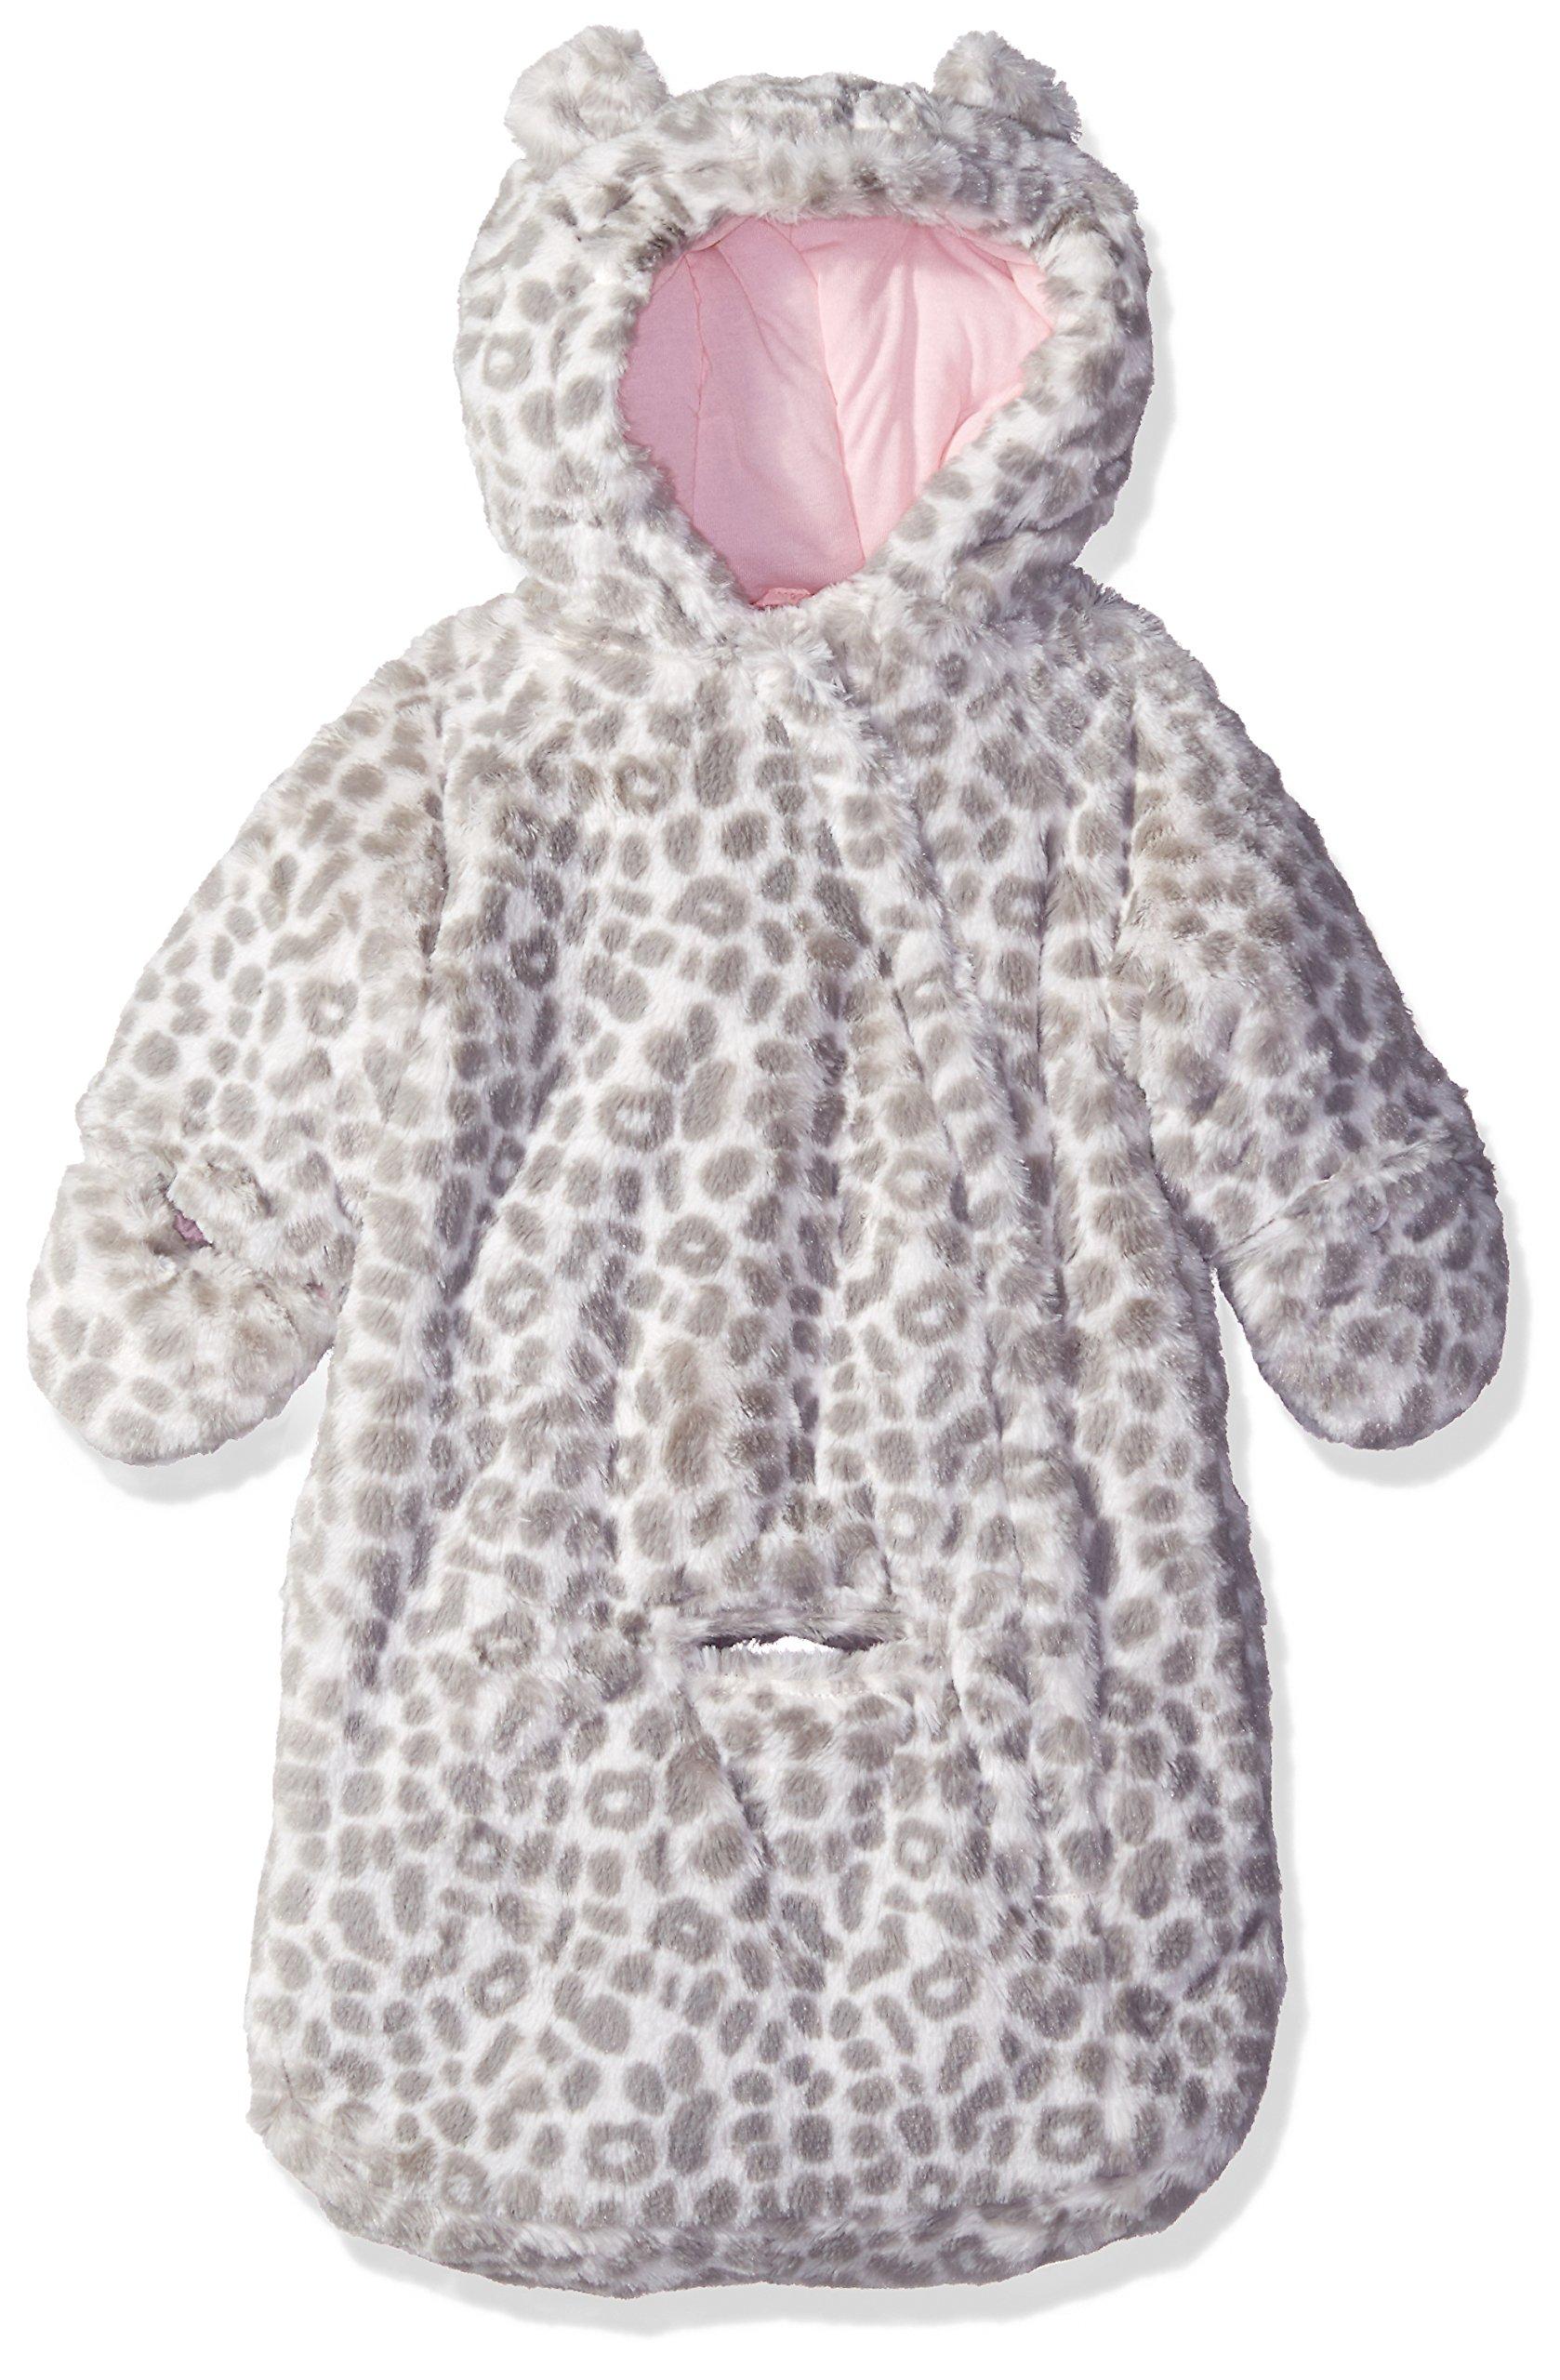 Carter's Girls' Soft Touch Faux Fur pram Bag, Cheetah, 0-6 Months